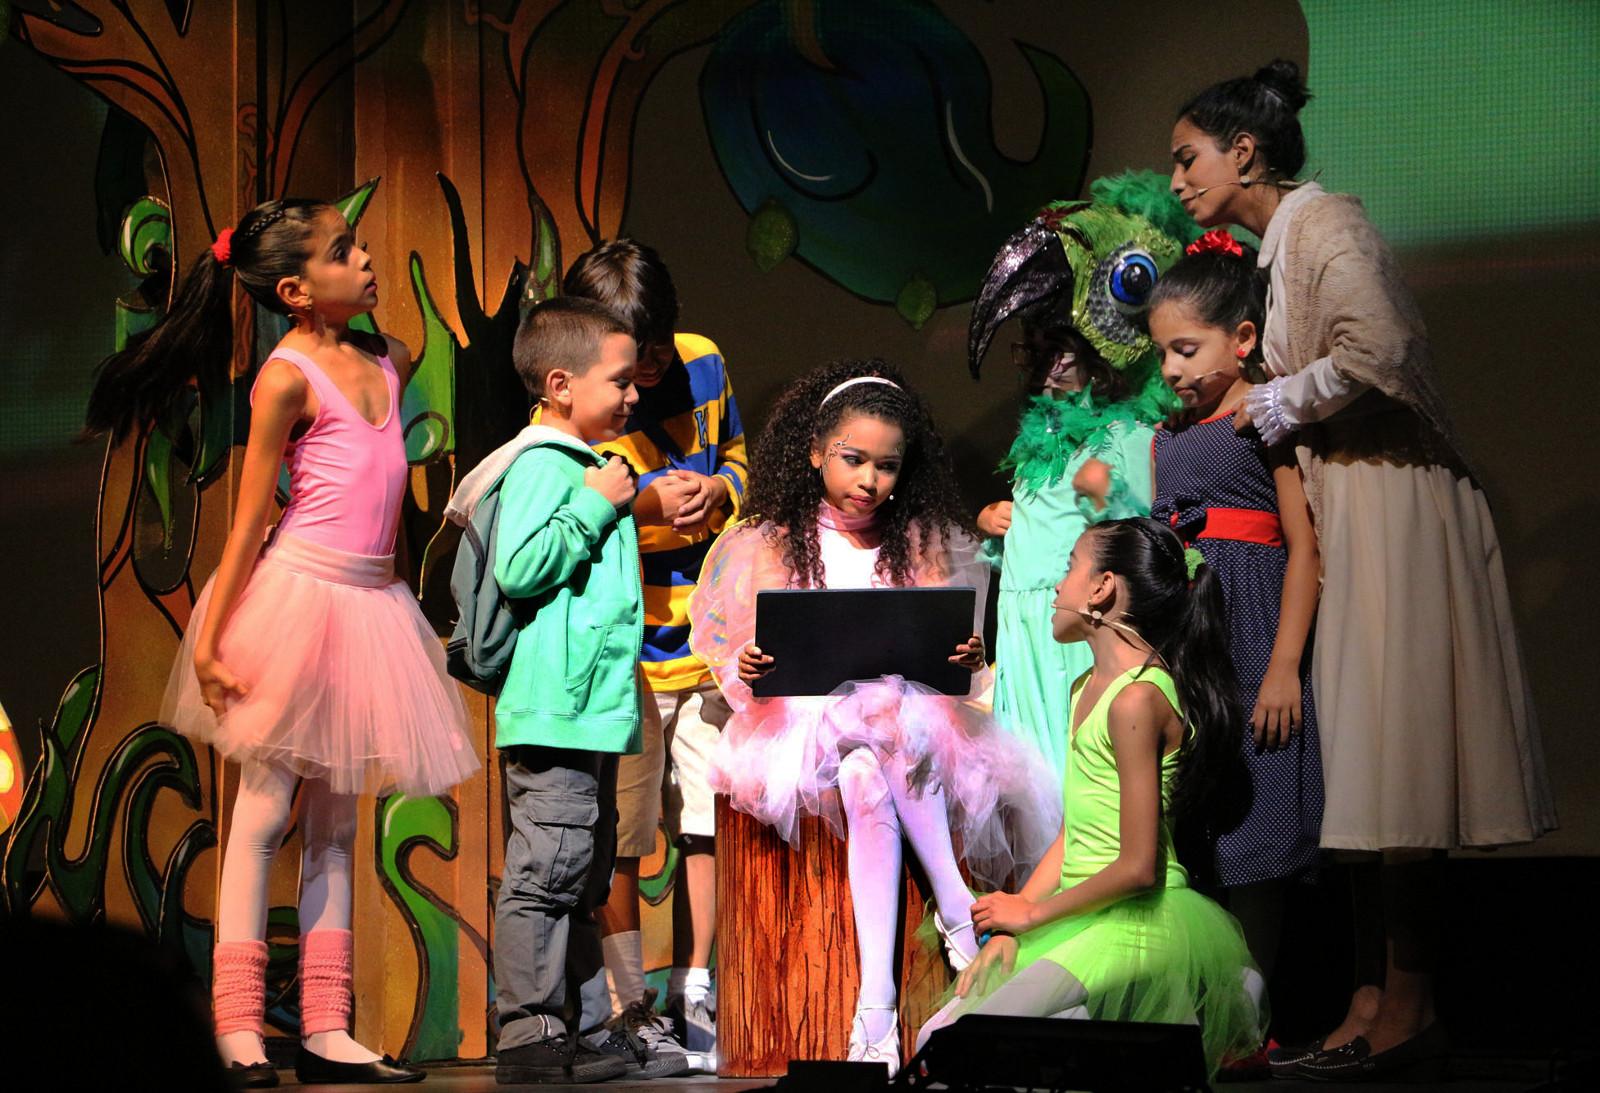 Obra de teatro infantil magia c trica se presentar en for La cocina obra de teatro